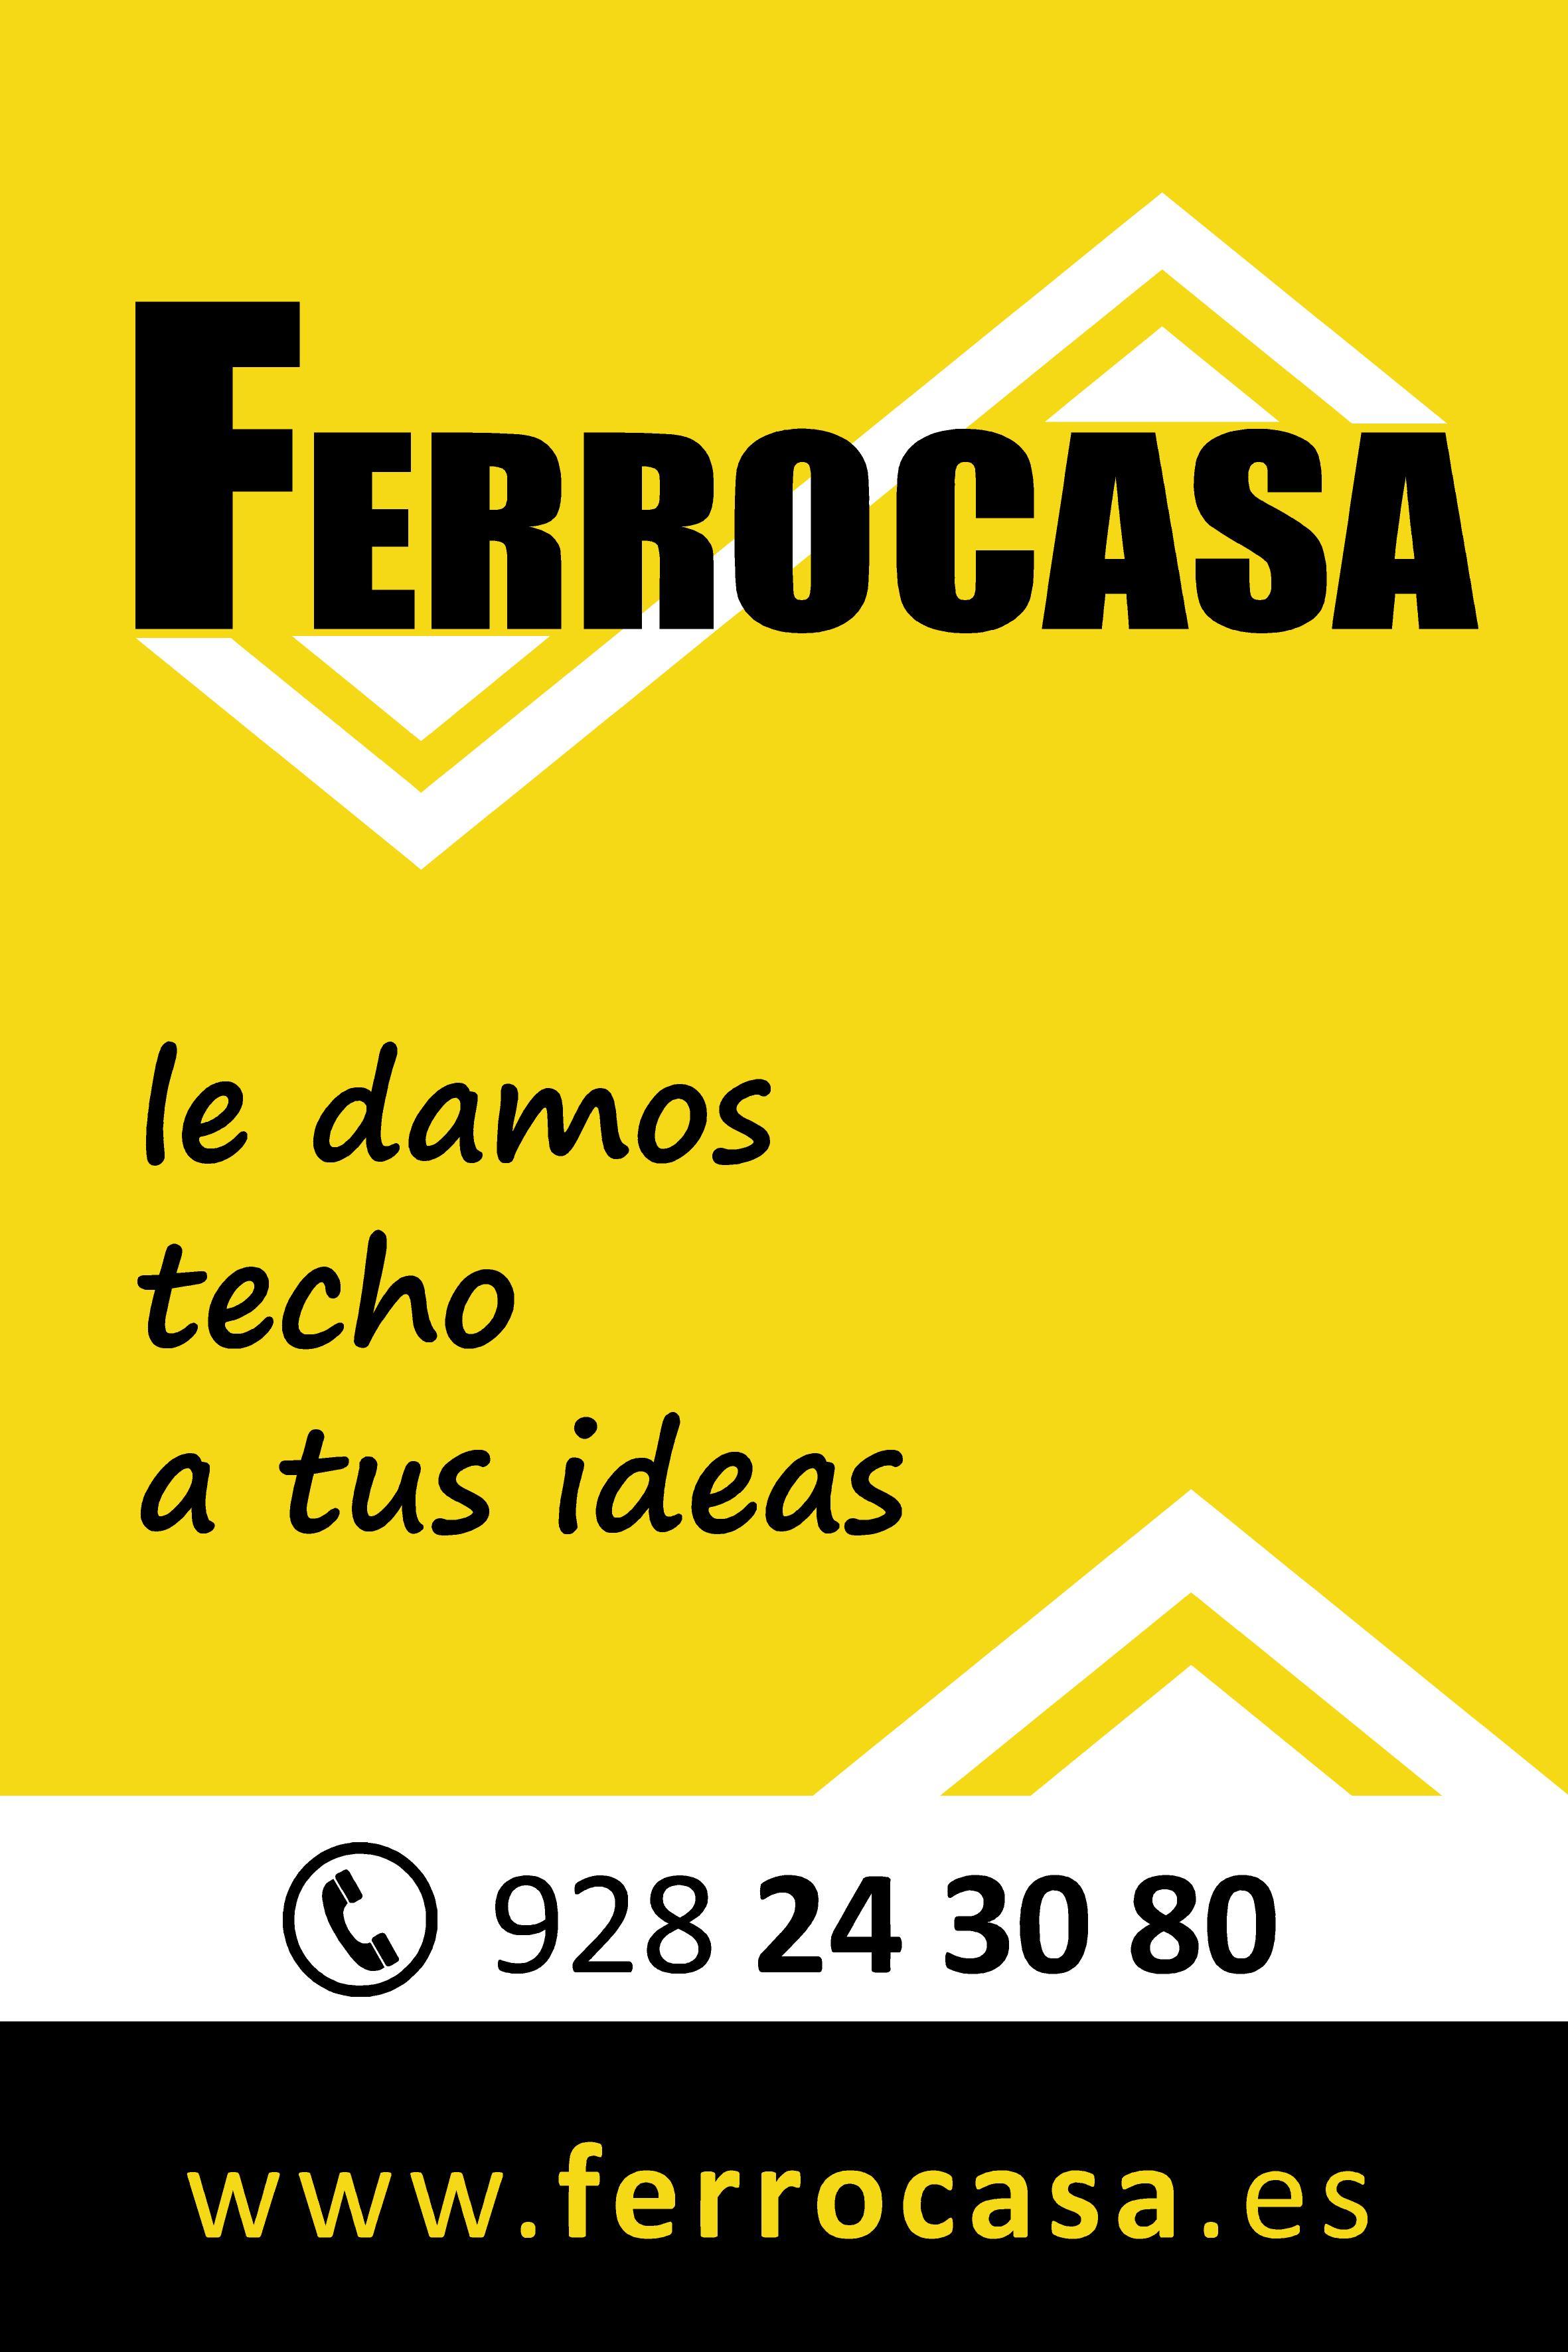 Ferrocasa